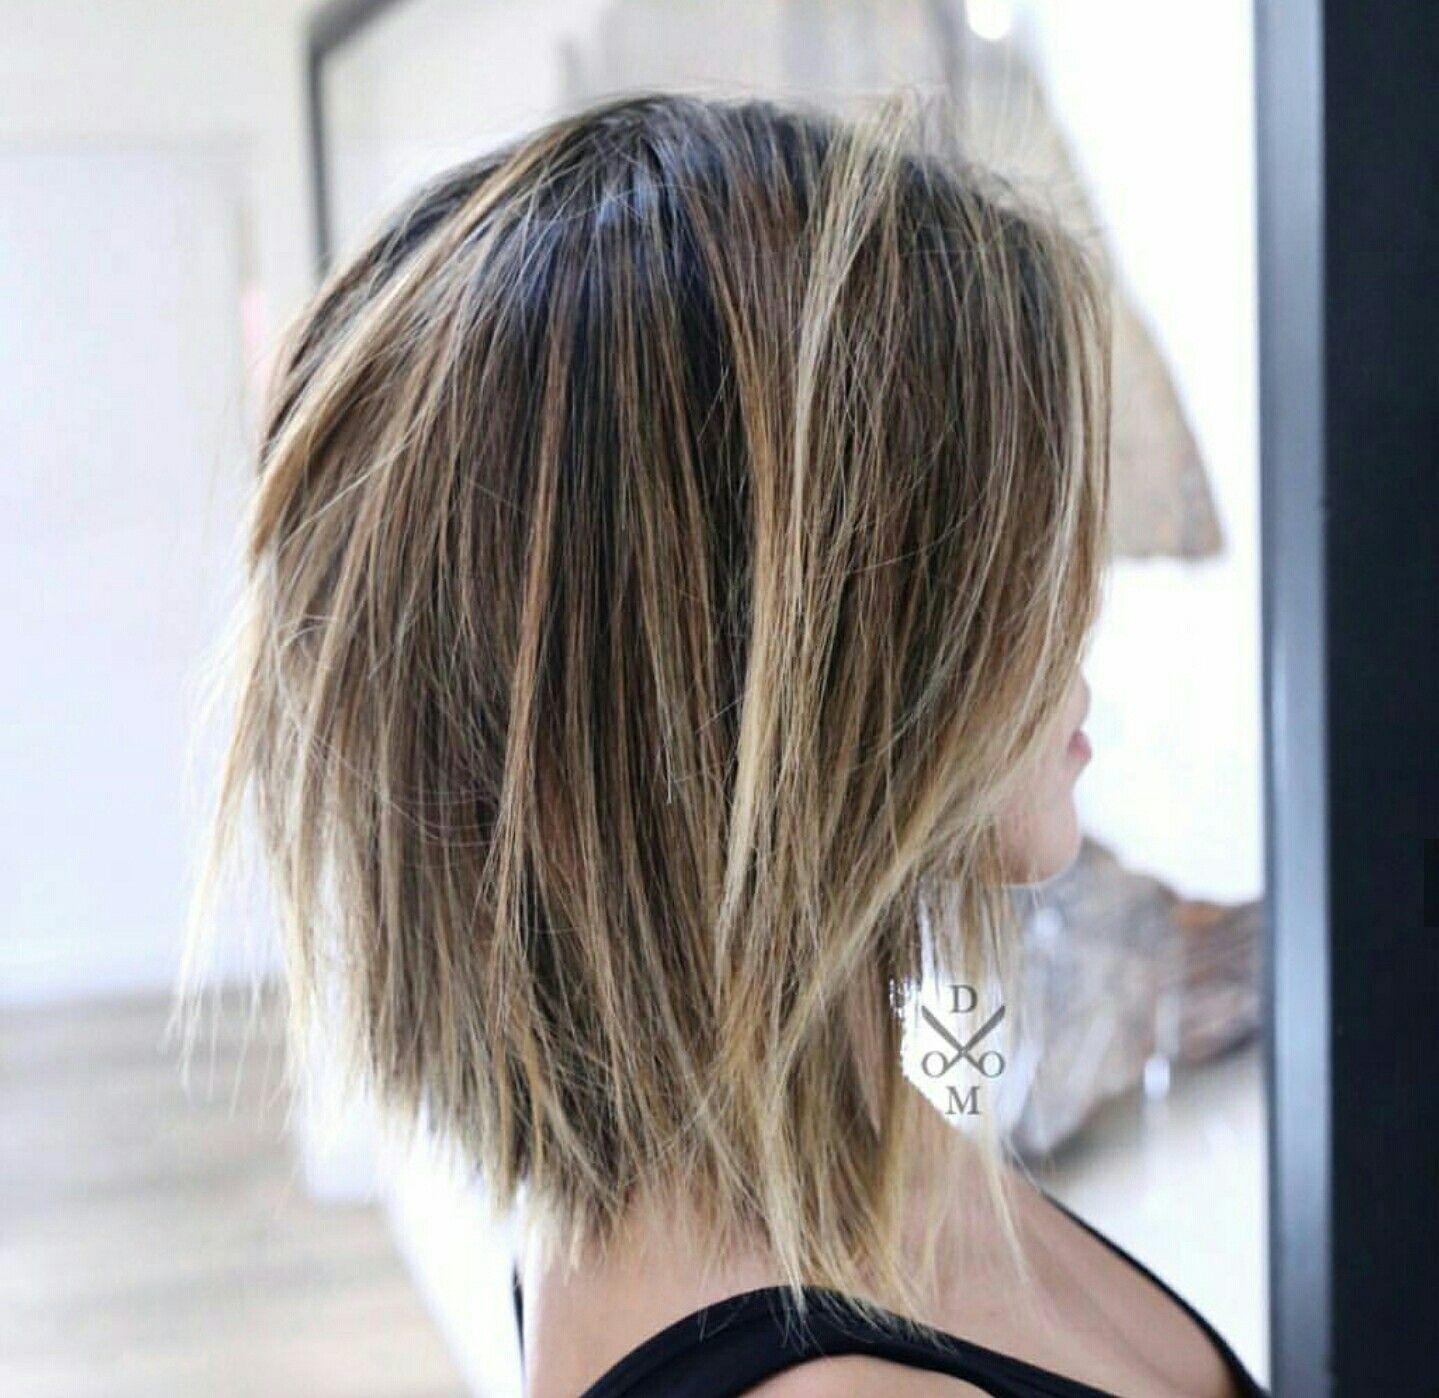 grow out inspo | hair! | hair cuts, textured bob hairstyles